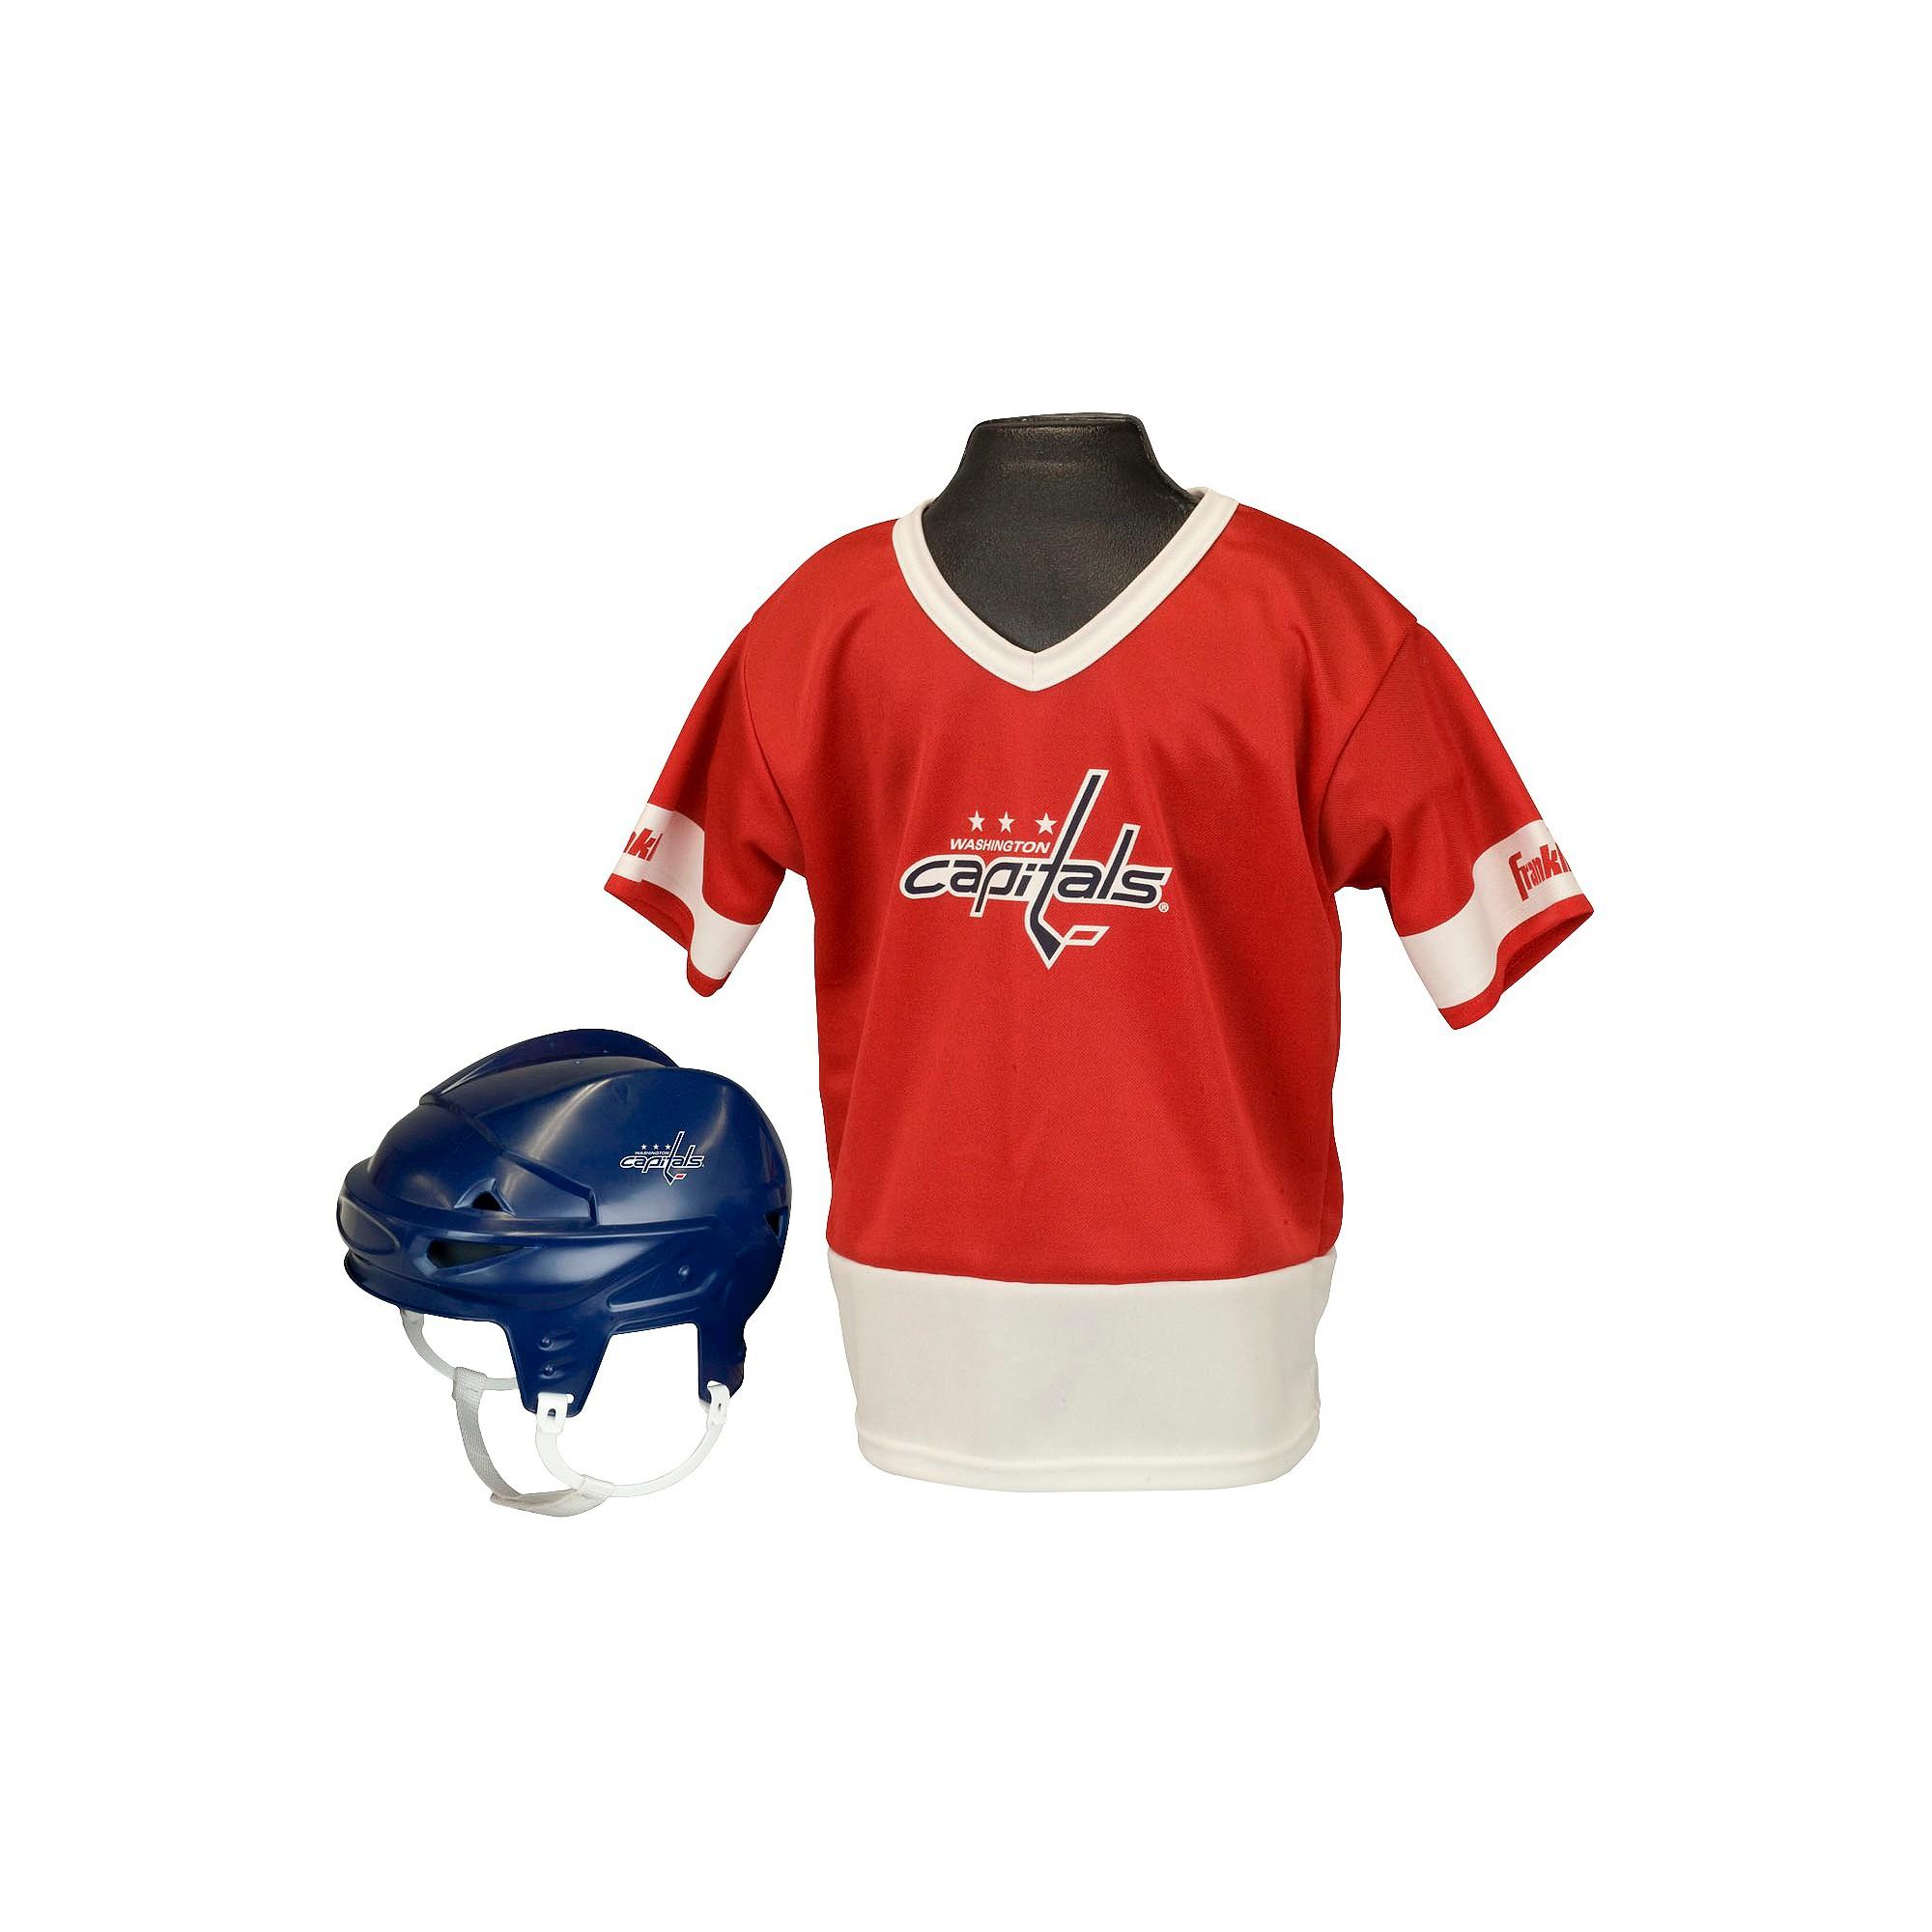 check out 43325 41f48 Washington Capitals Franklin Sports Licensed Hockey Uniform ...